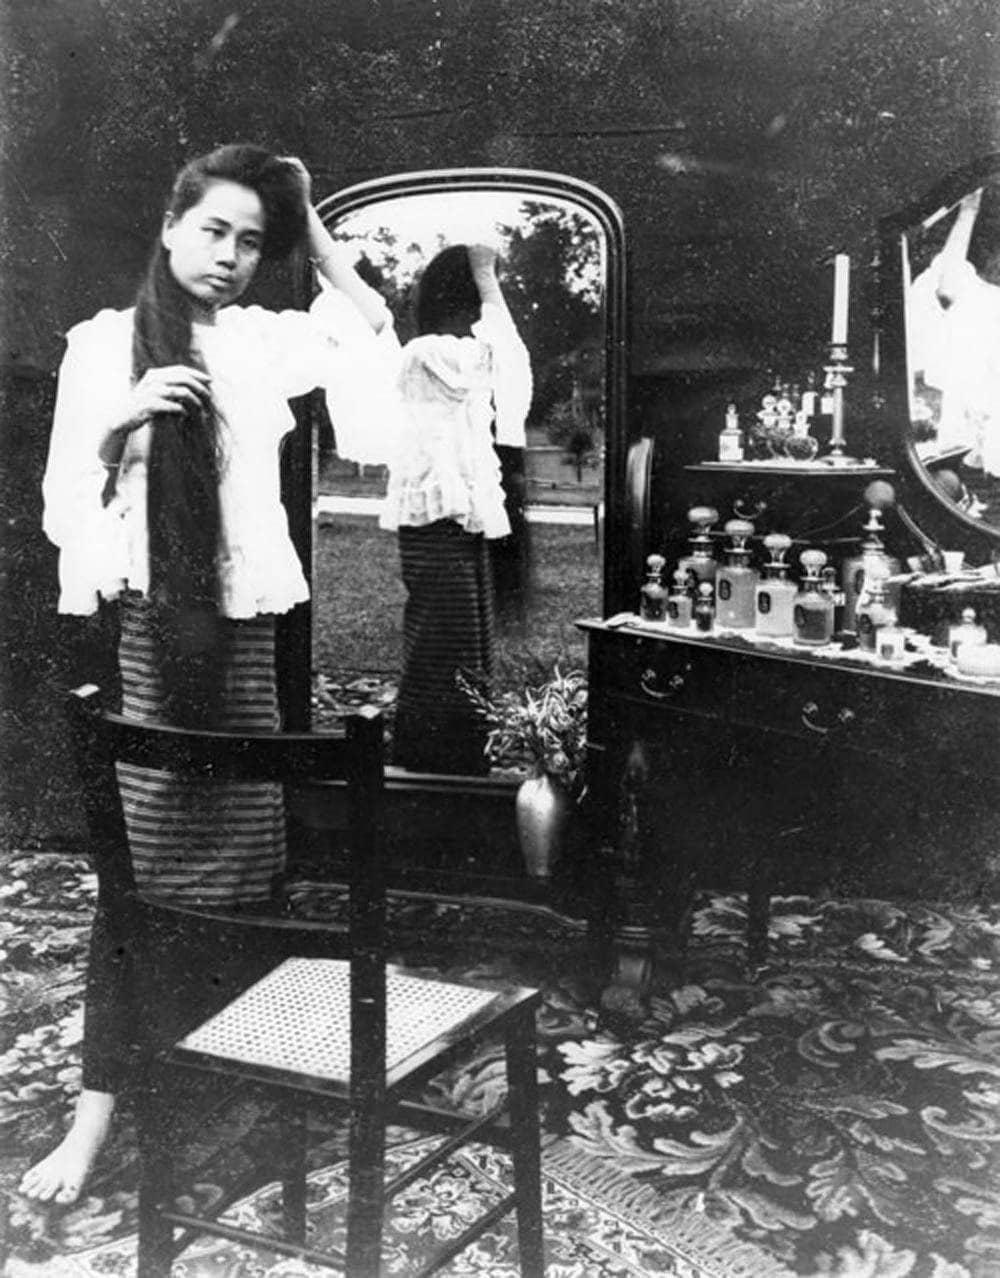 Dara Rasamee unwinding her hair before the full-length mirror. c1902.